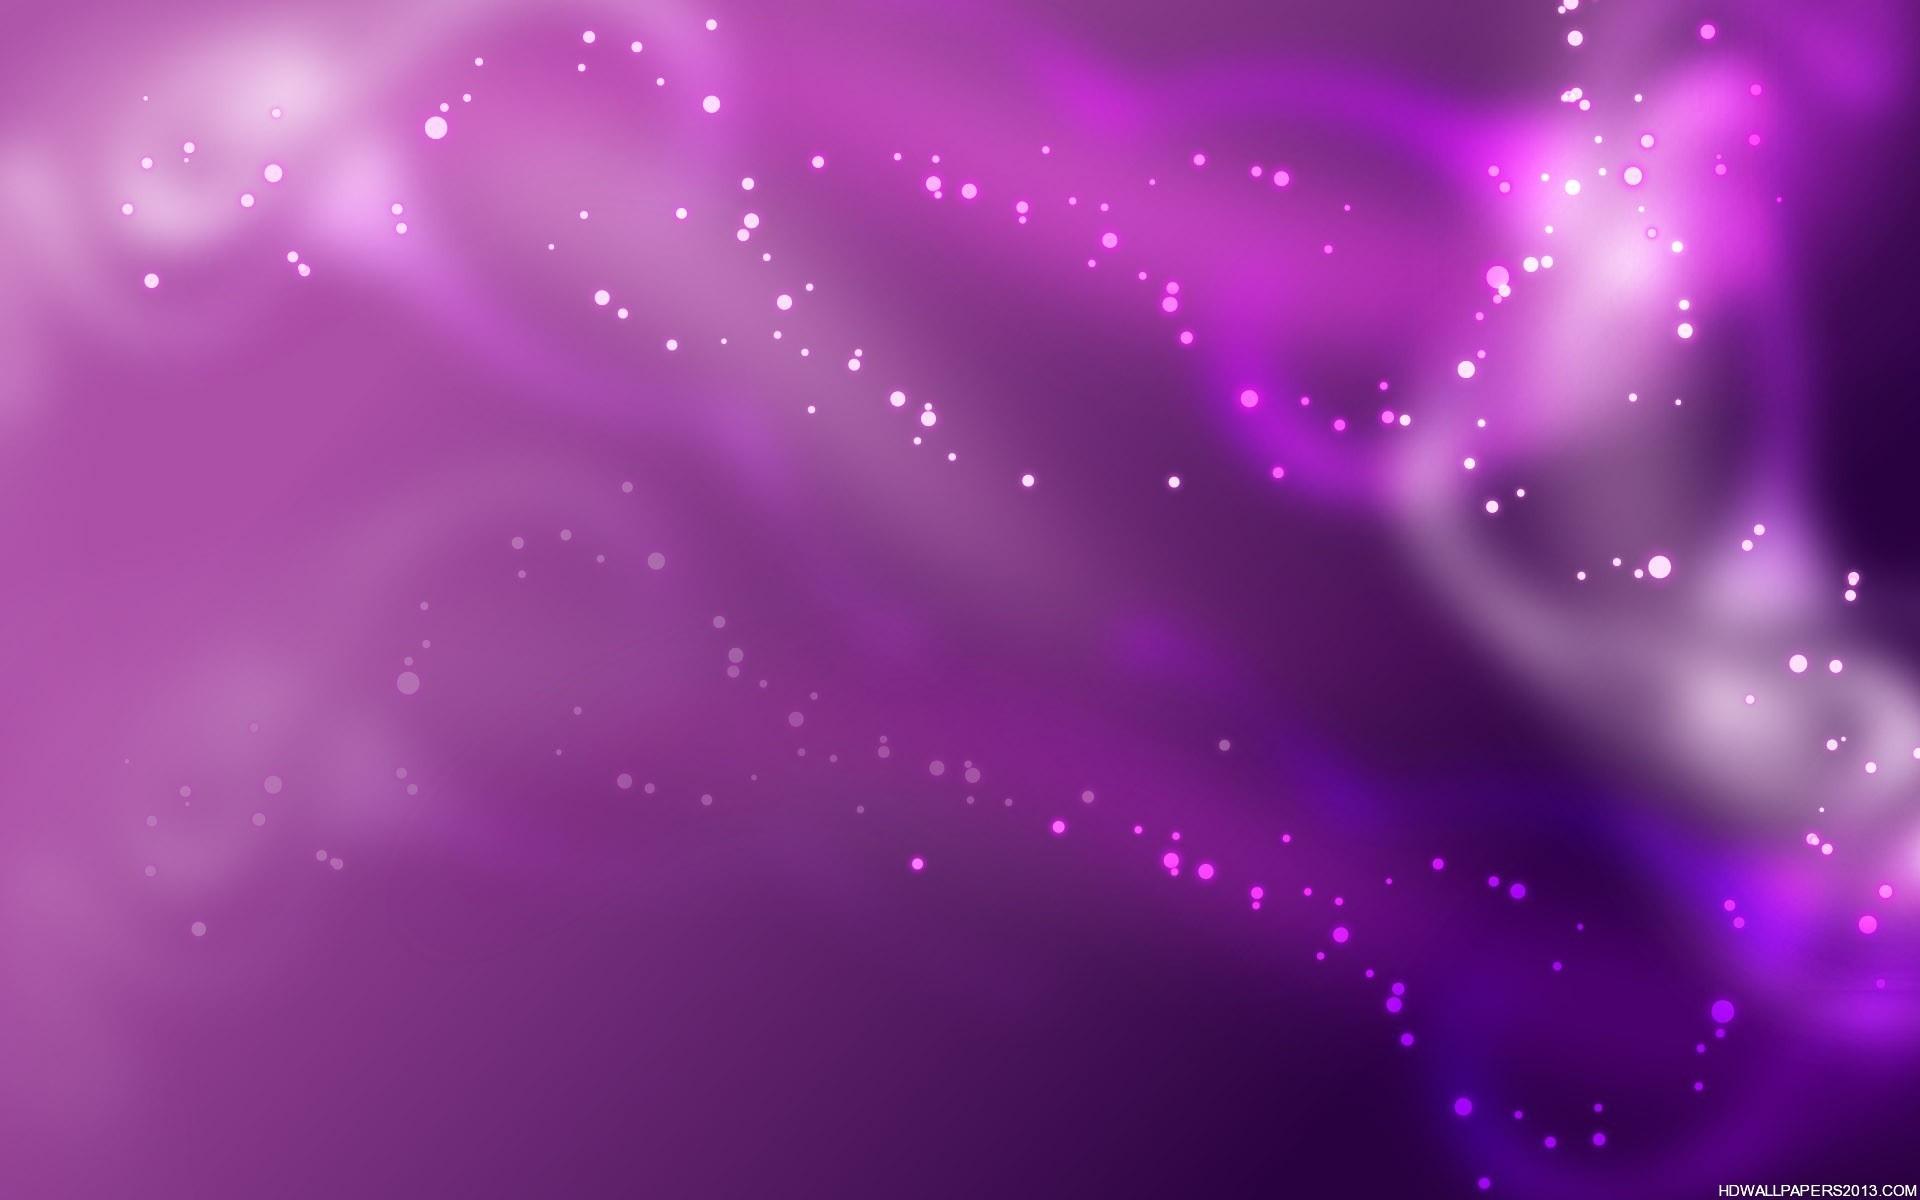 wallpaper hd hd wallpapers purple colorful wallpaper hd hd backgrounds